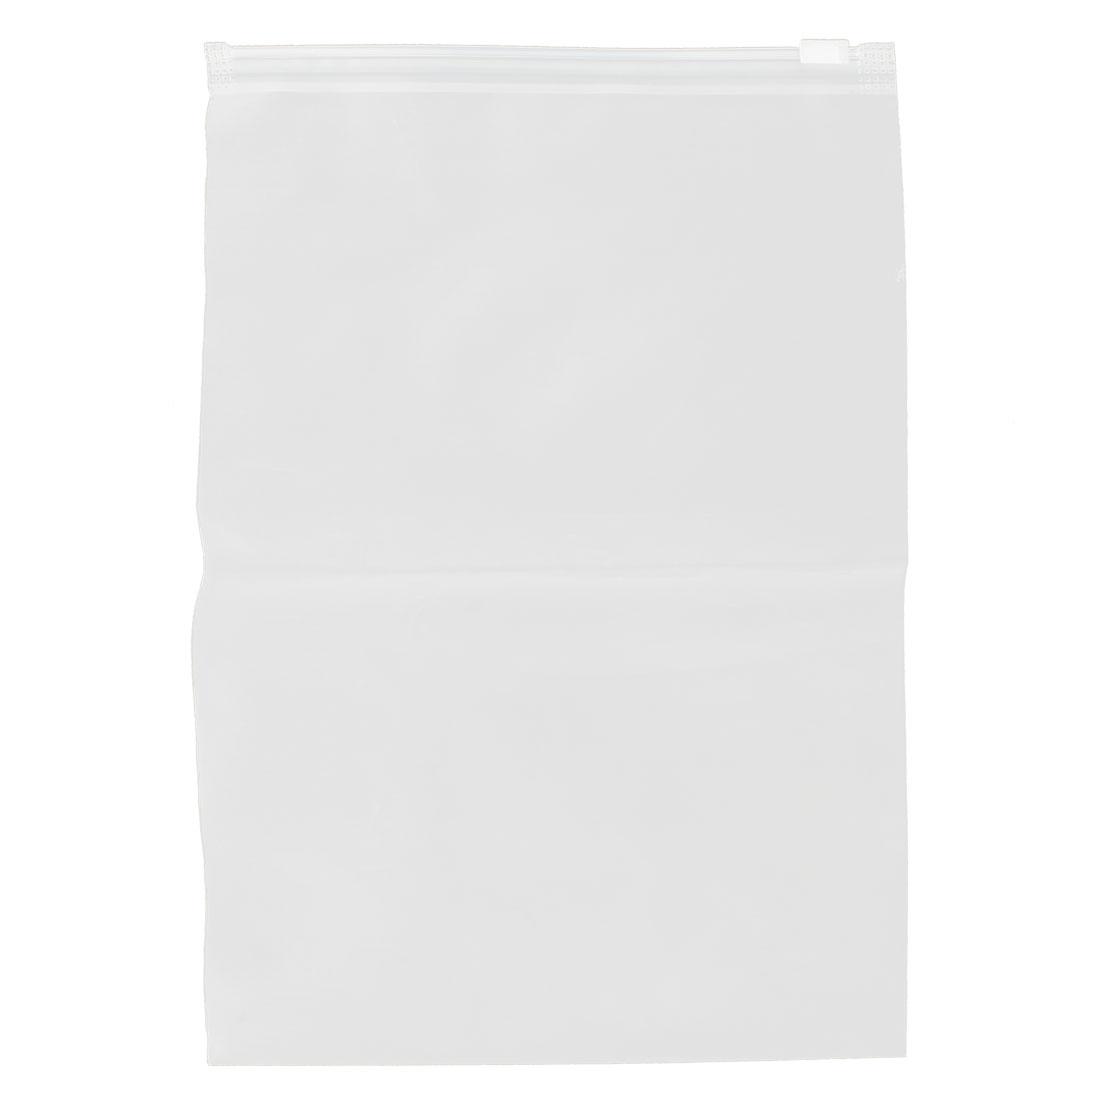 17cm x 25cm 20C Transparent Waterproof PVC Seal Storage Bag Travel Luggage Suitcase Cloths Cover Holder